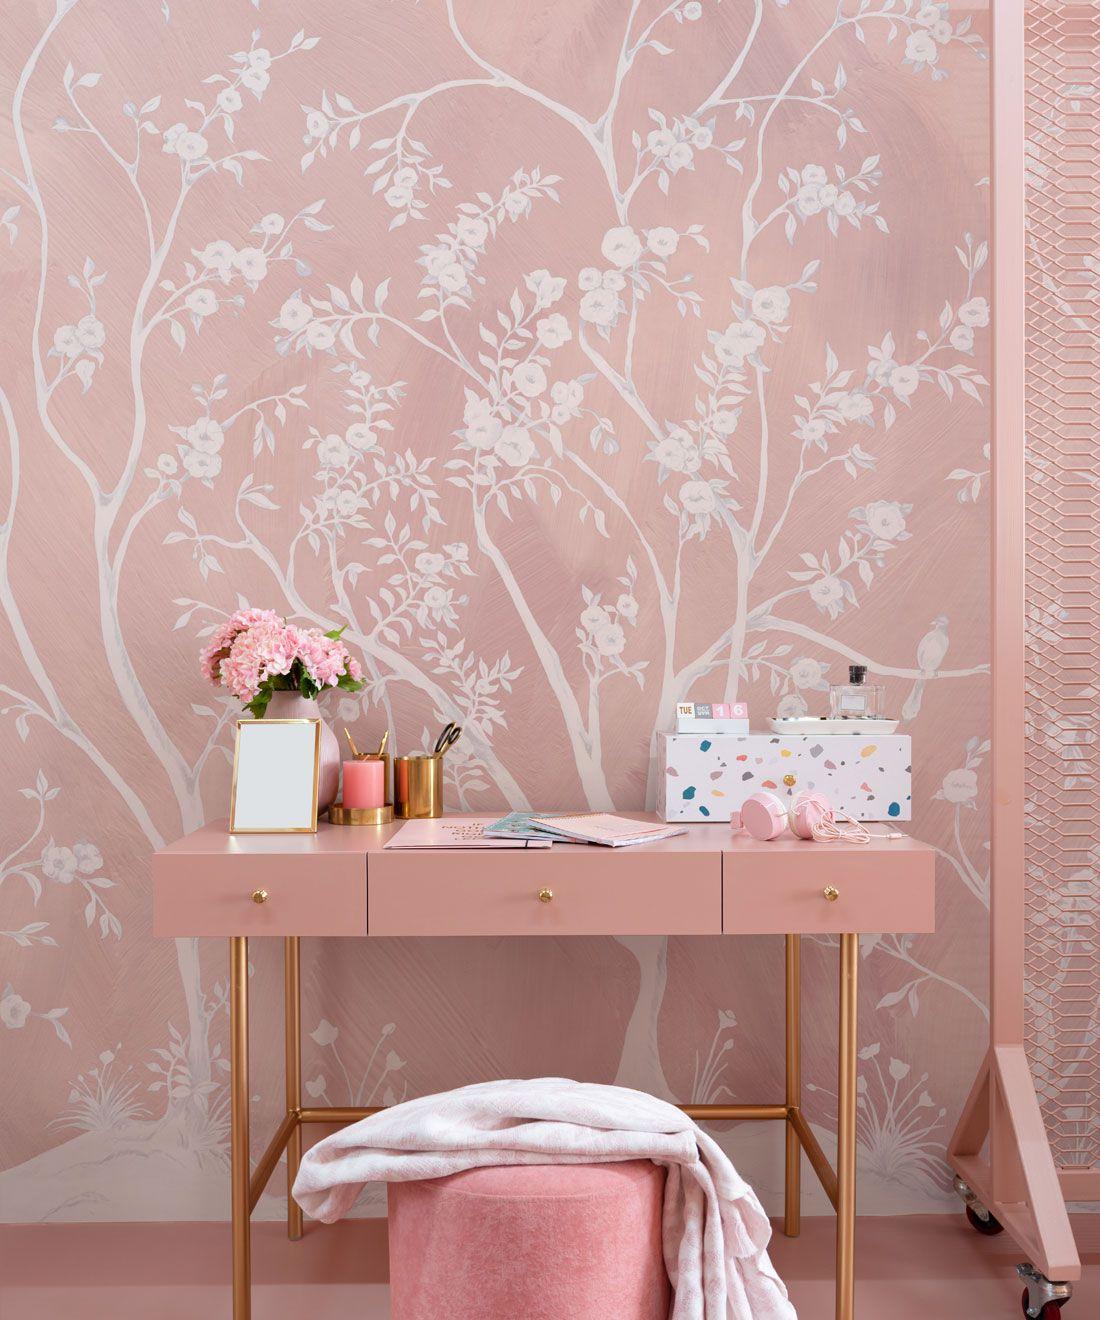 Blooming Joy • Chinoiserie Wallpaper by Danica Andler • Pink Blush Insitu